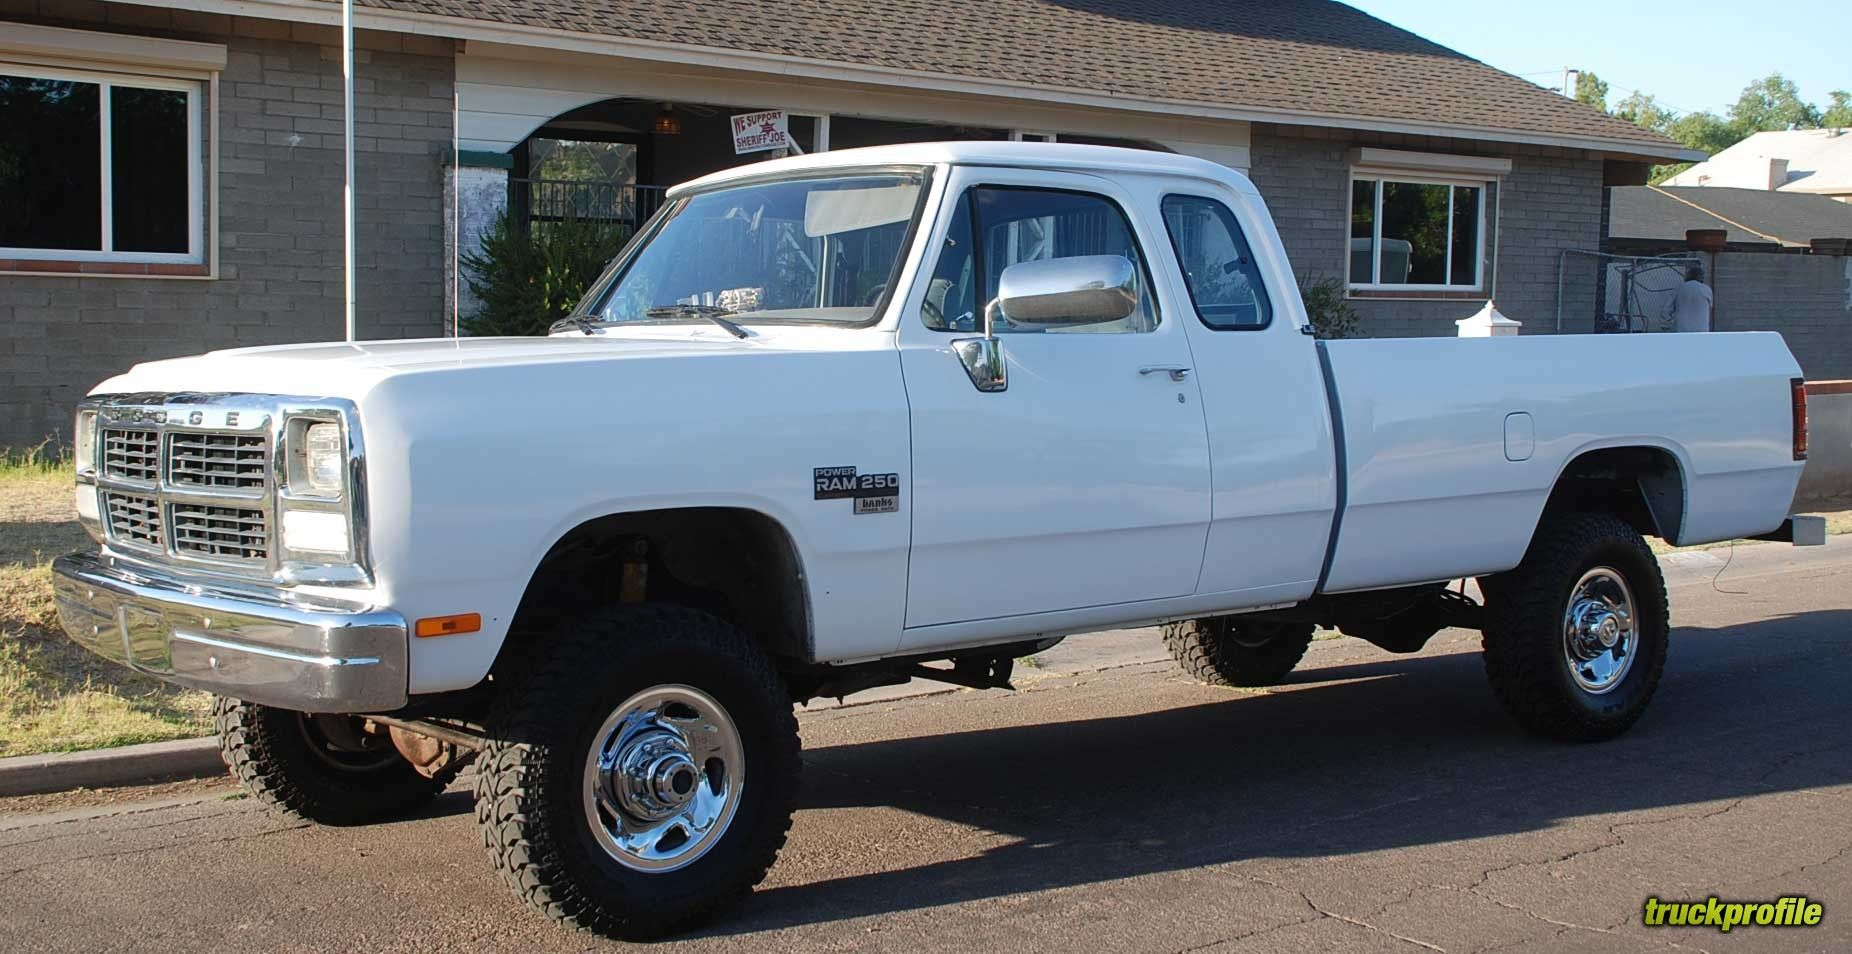 White Lifted Older Dodge Ram Truck Dodge Trucks Ram Dodge Ram Dodge Ram 2500